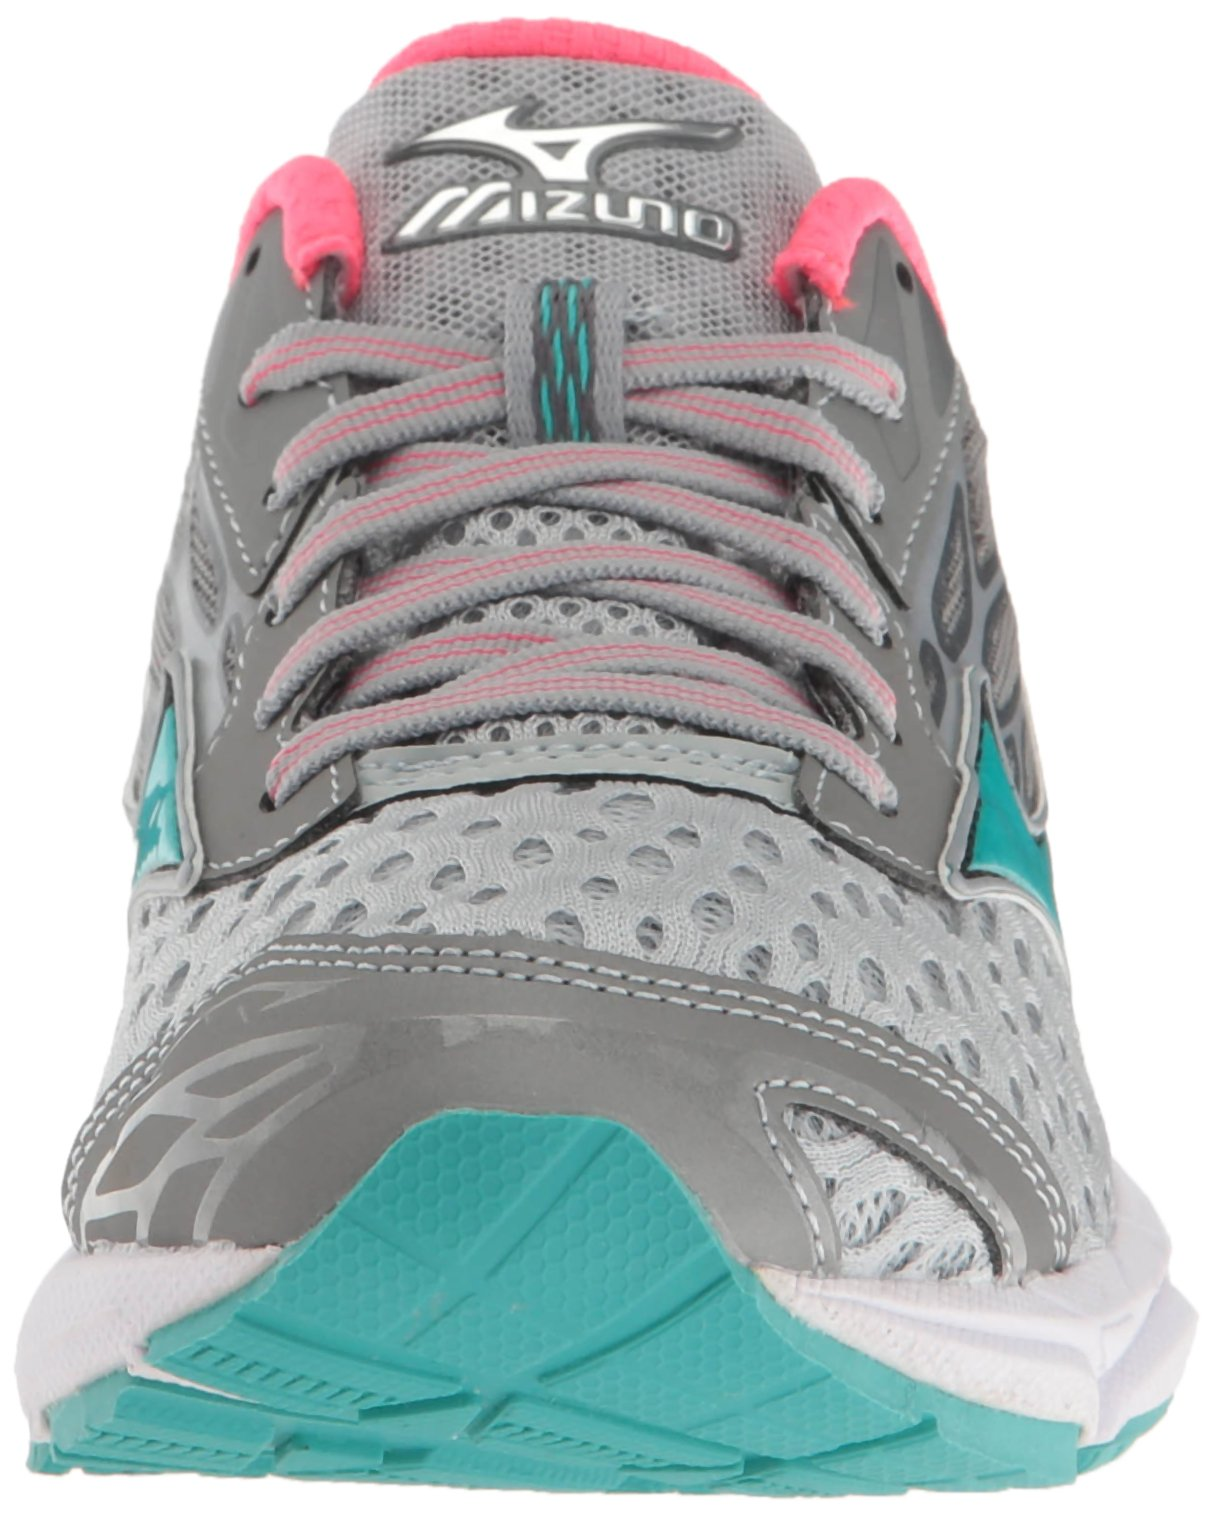 Mizuno Women's Wave Catalyst 2 Running Shoe, Grey/Mint, 9 B US by Mizuno (Image #4)